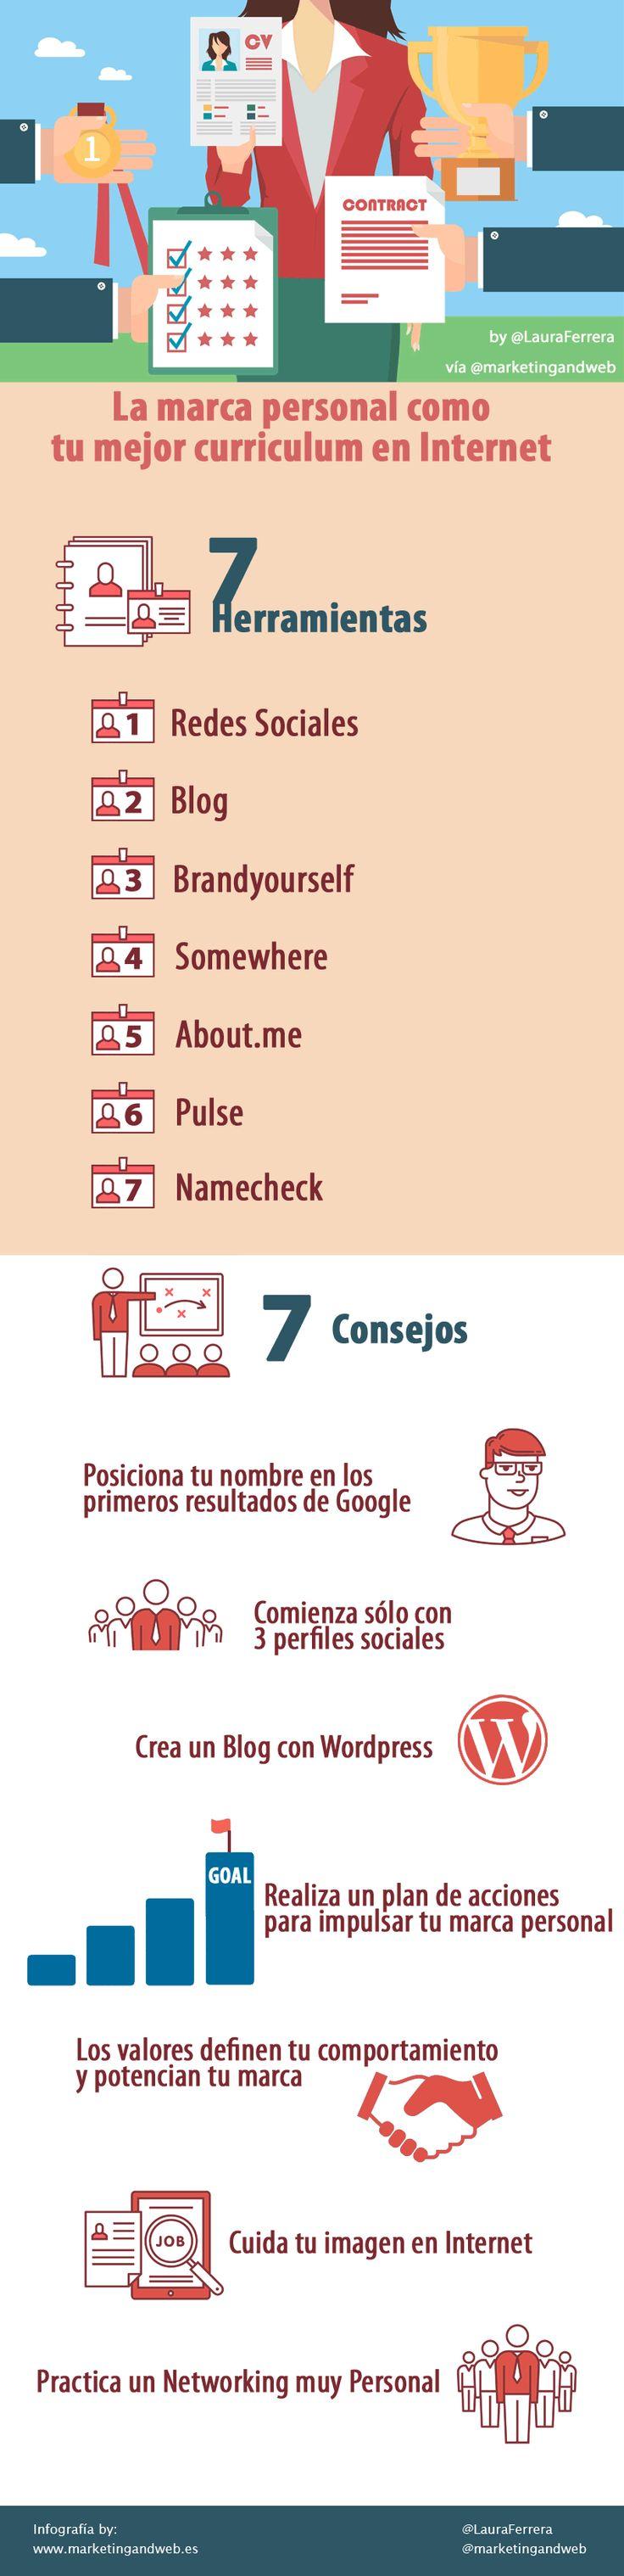 #MarcaPersonal: tu mejor curriculum en Internet, #infografía #rrhh #empleo